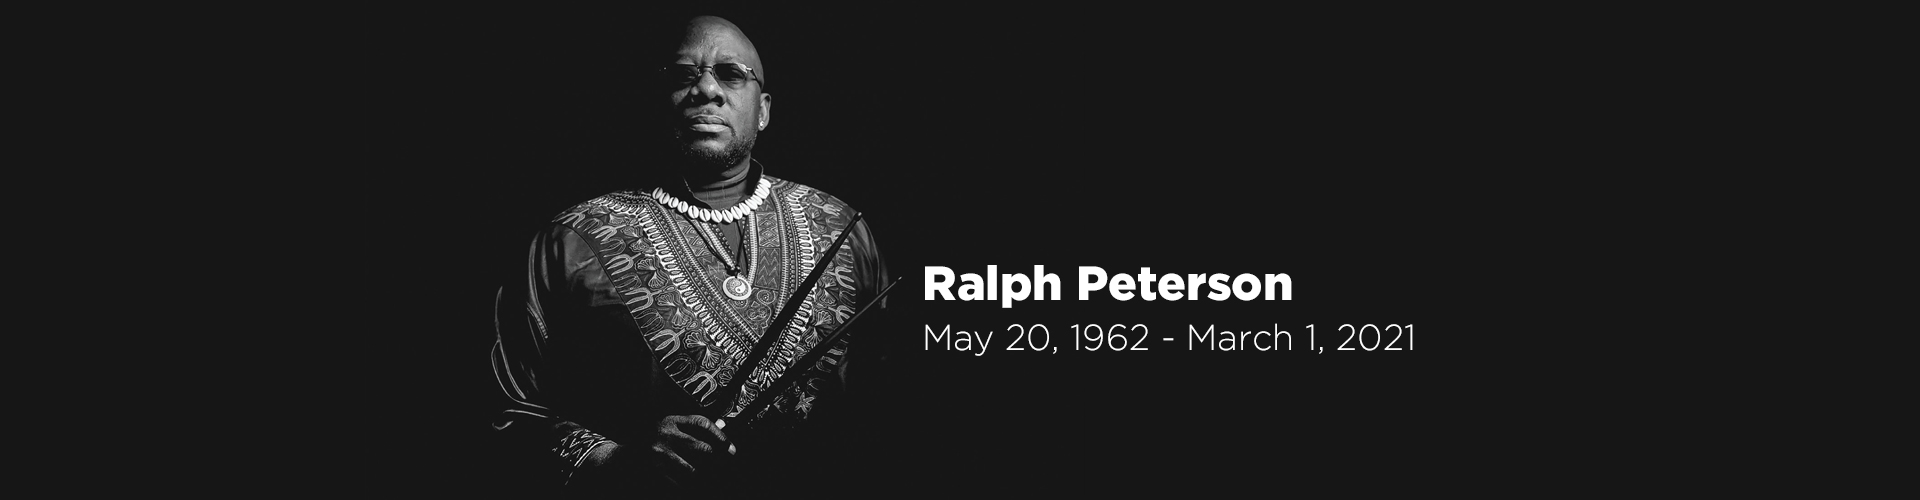 Ralph Peterson Tribute